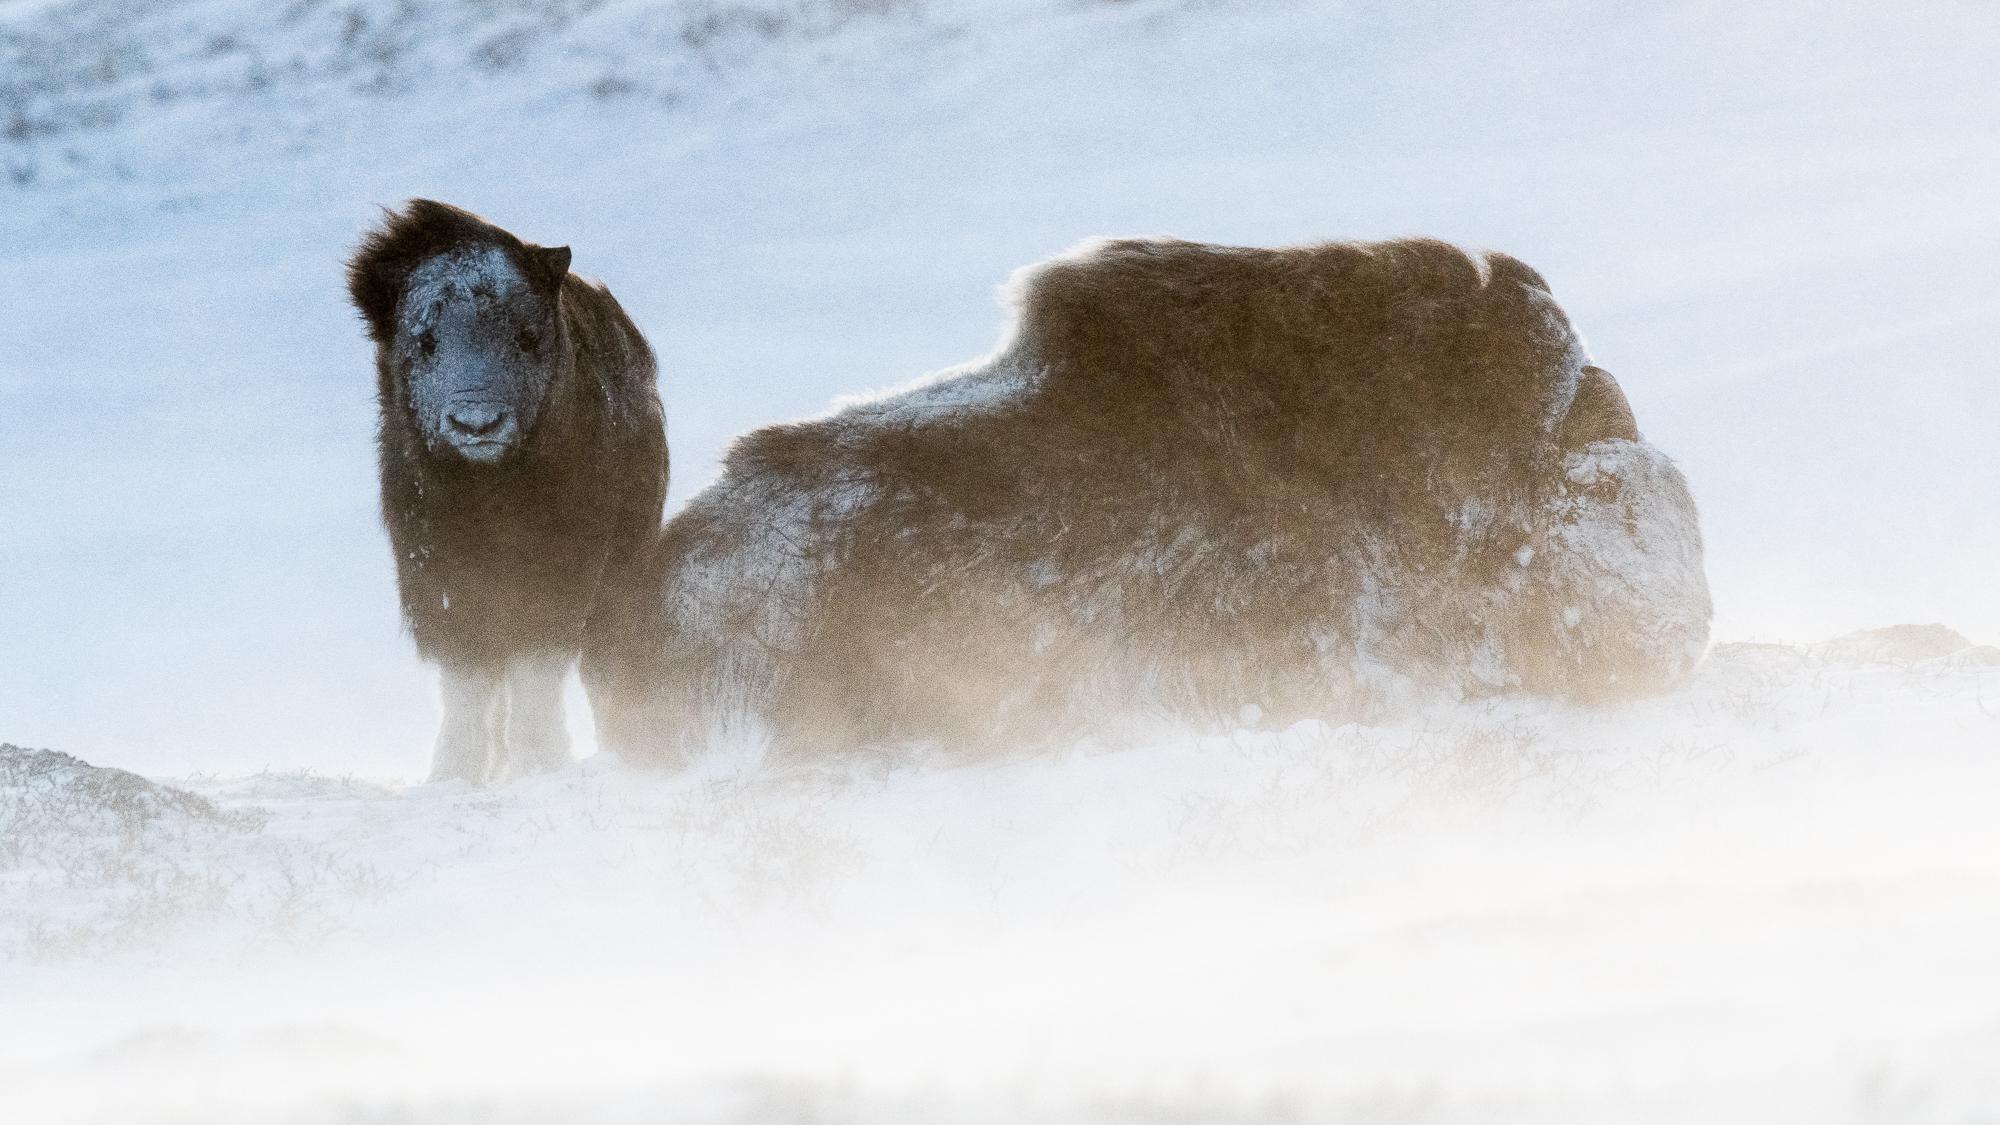 Norway Winter Workshop 2019. ©Bjørn Joachimsen